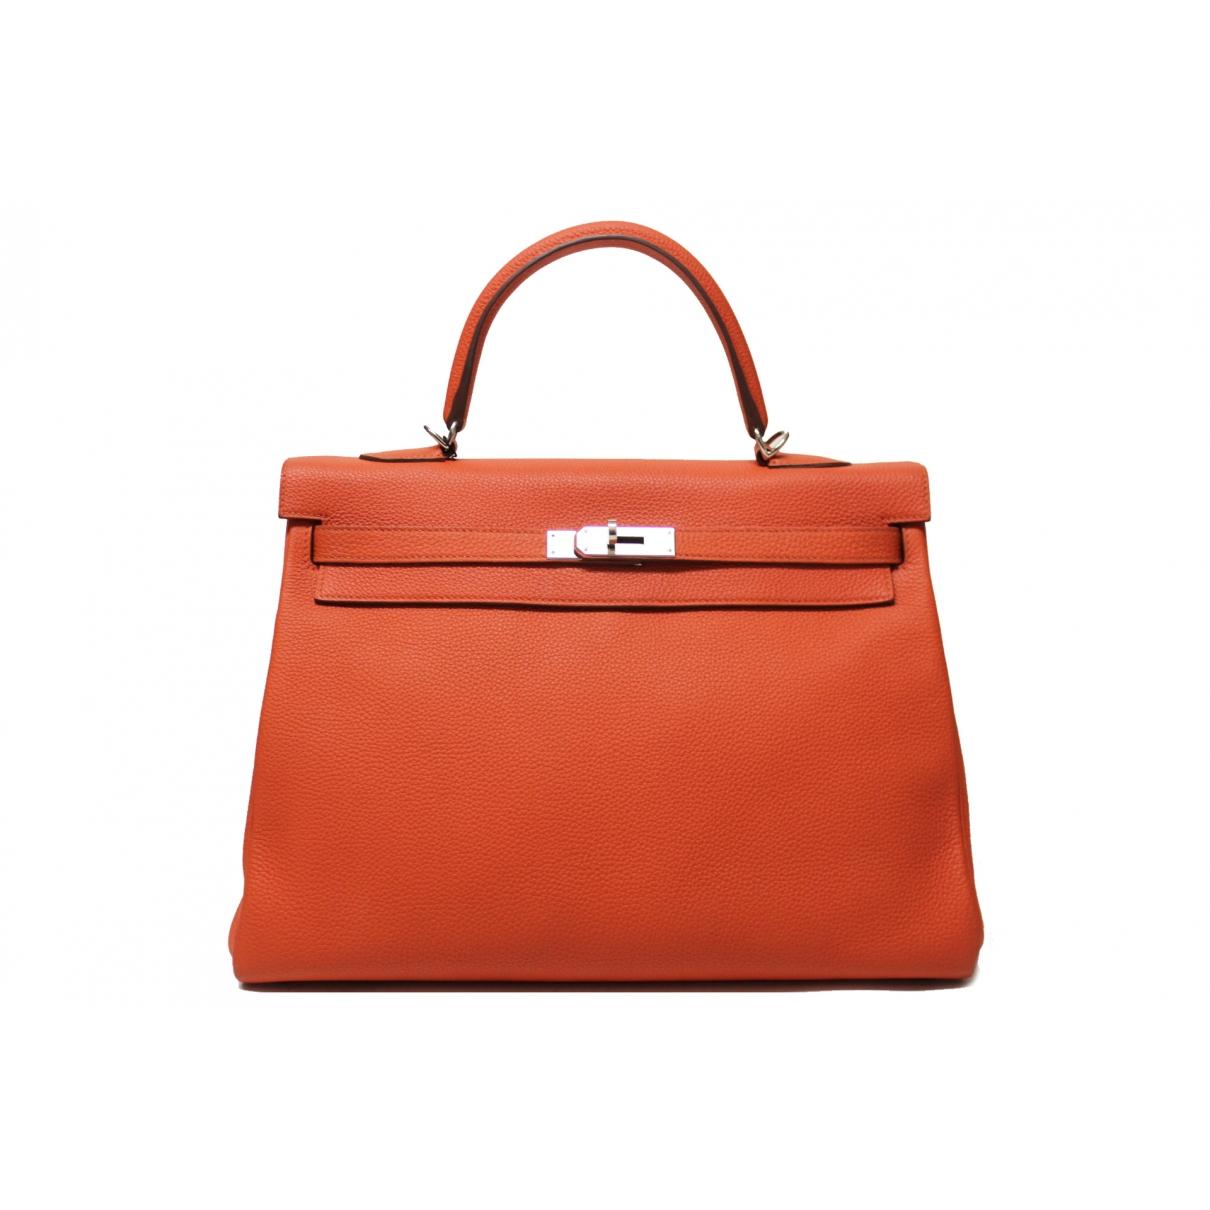 Hermès Kelly 35 Orange Leather handbag for Women \N